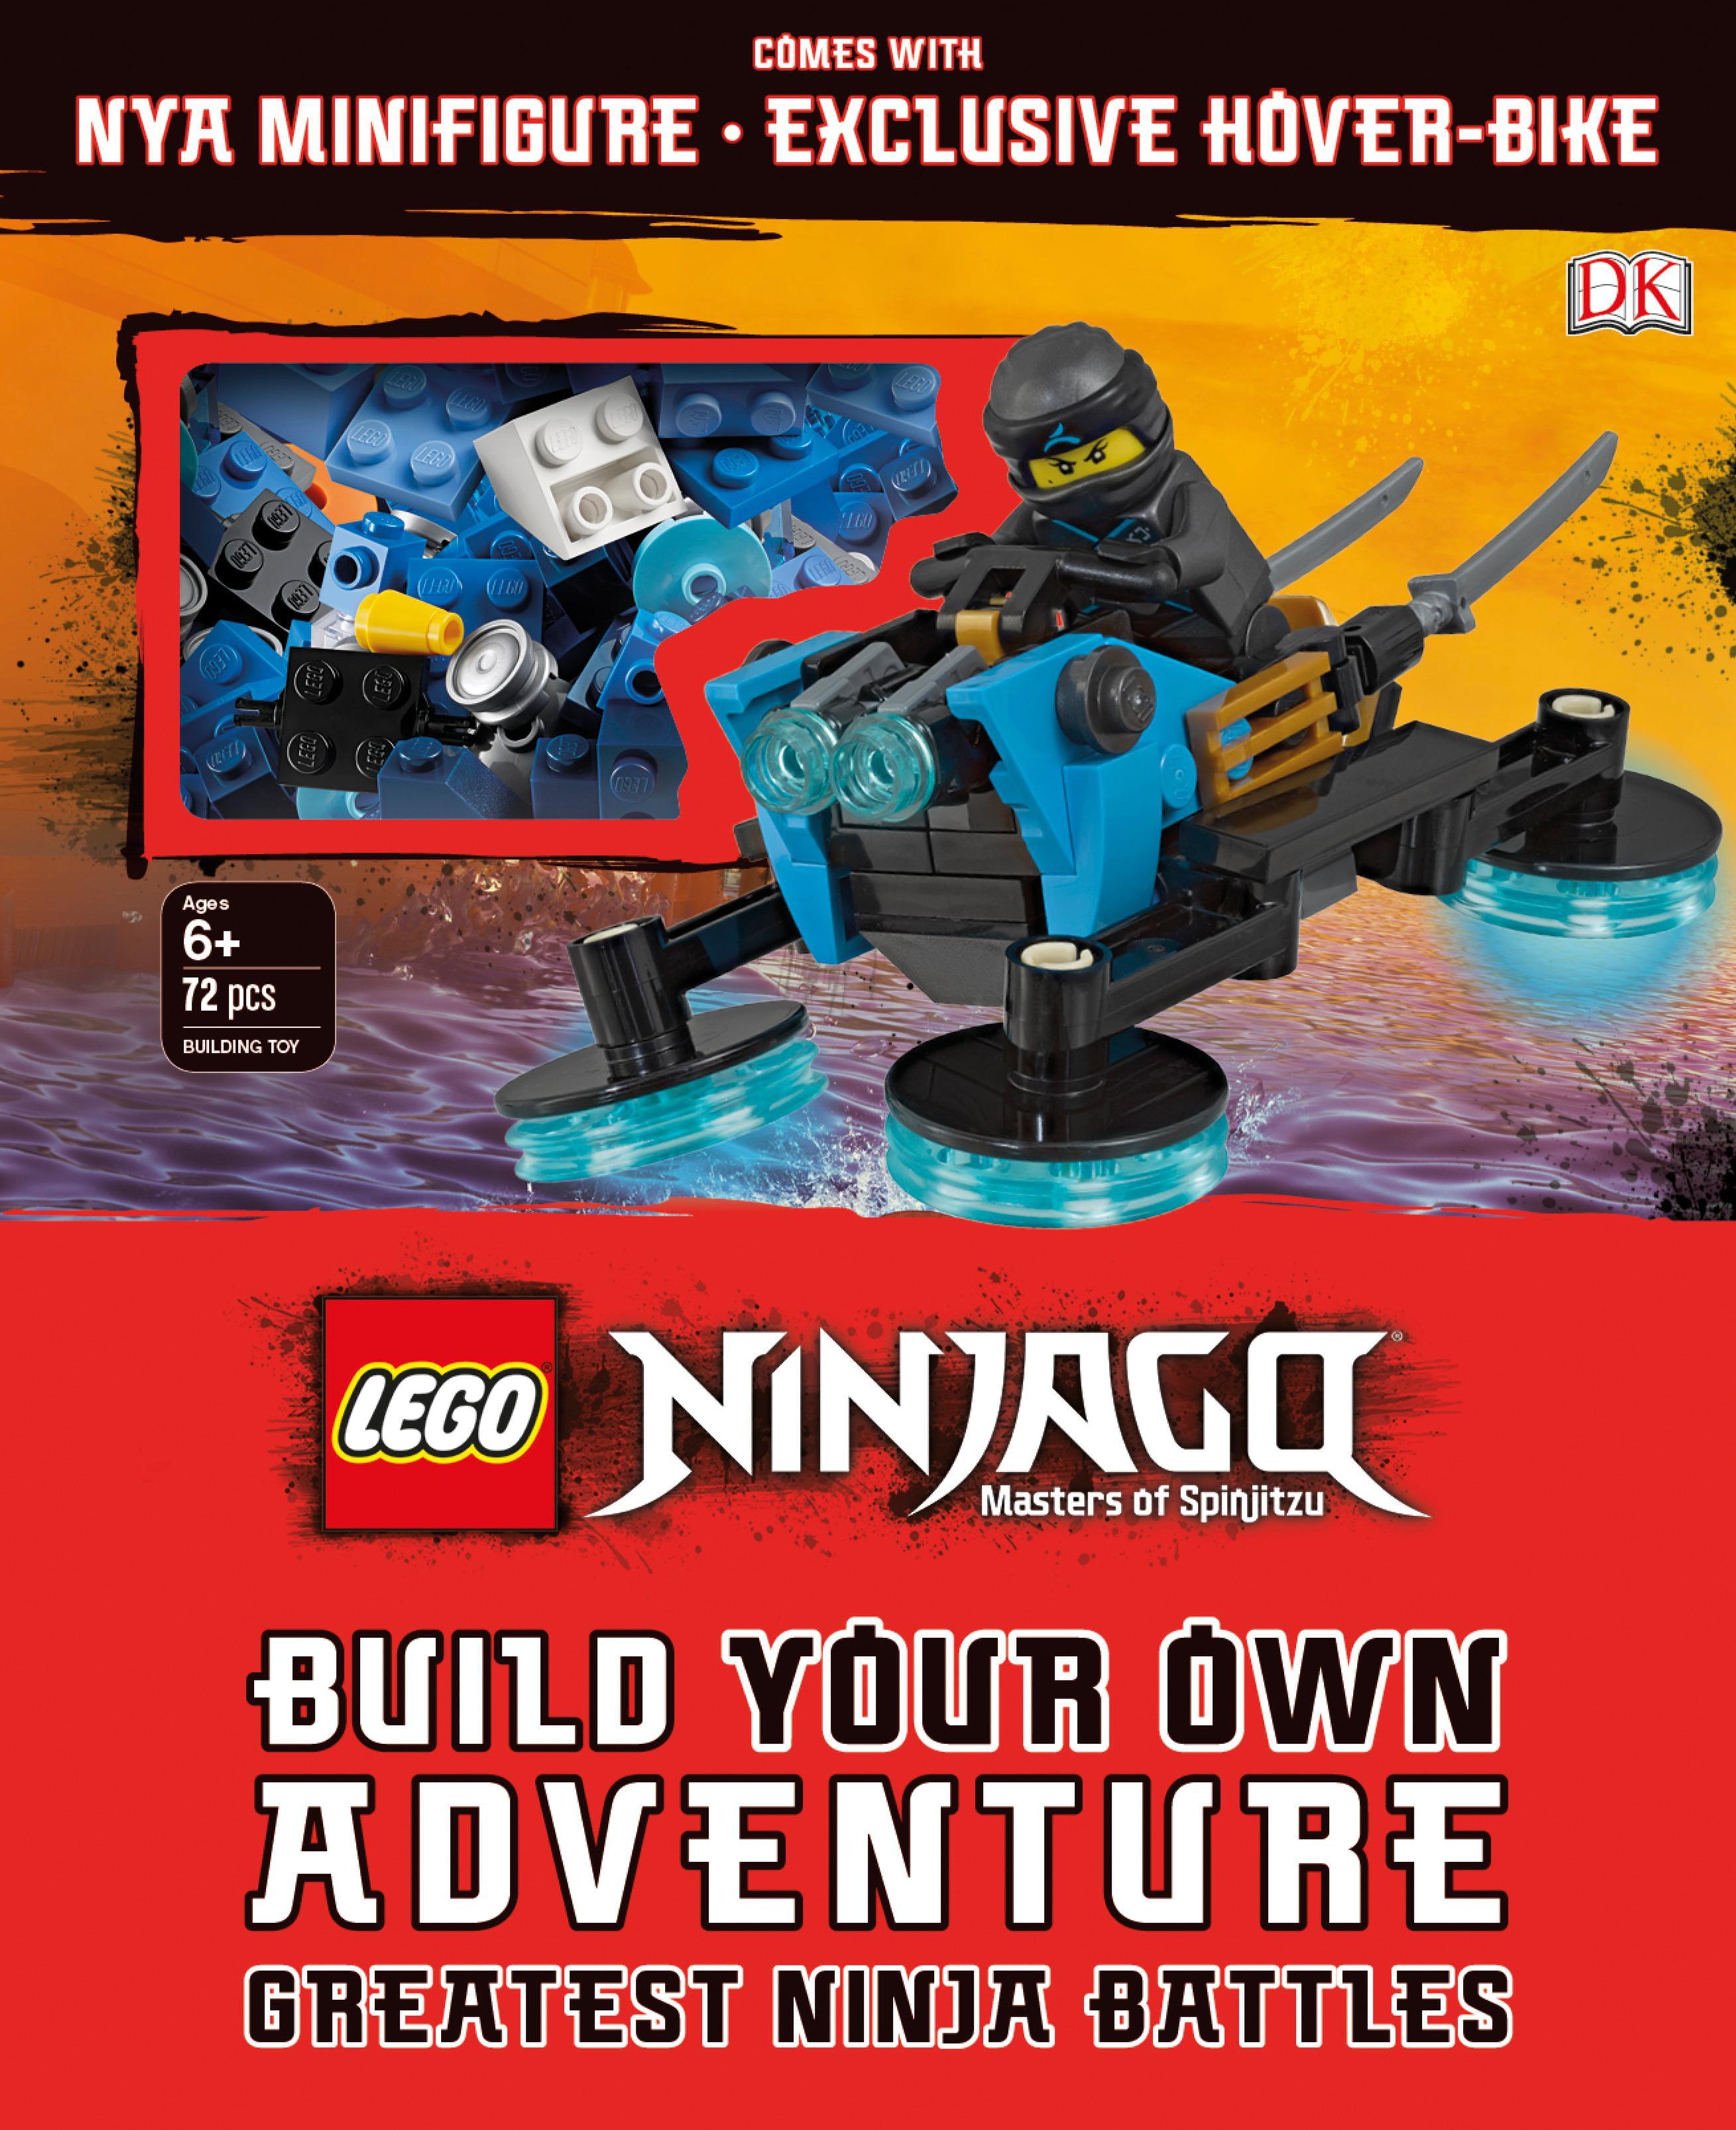 Book of Secrets w// Cole Minifigure   Toys  Ninjas  New! Lego Ninjago